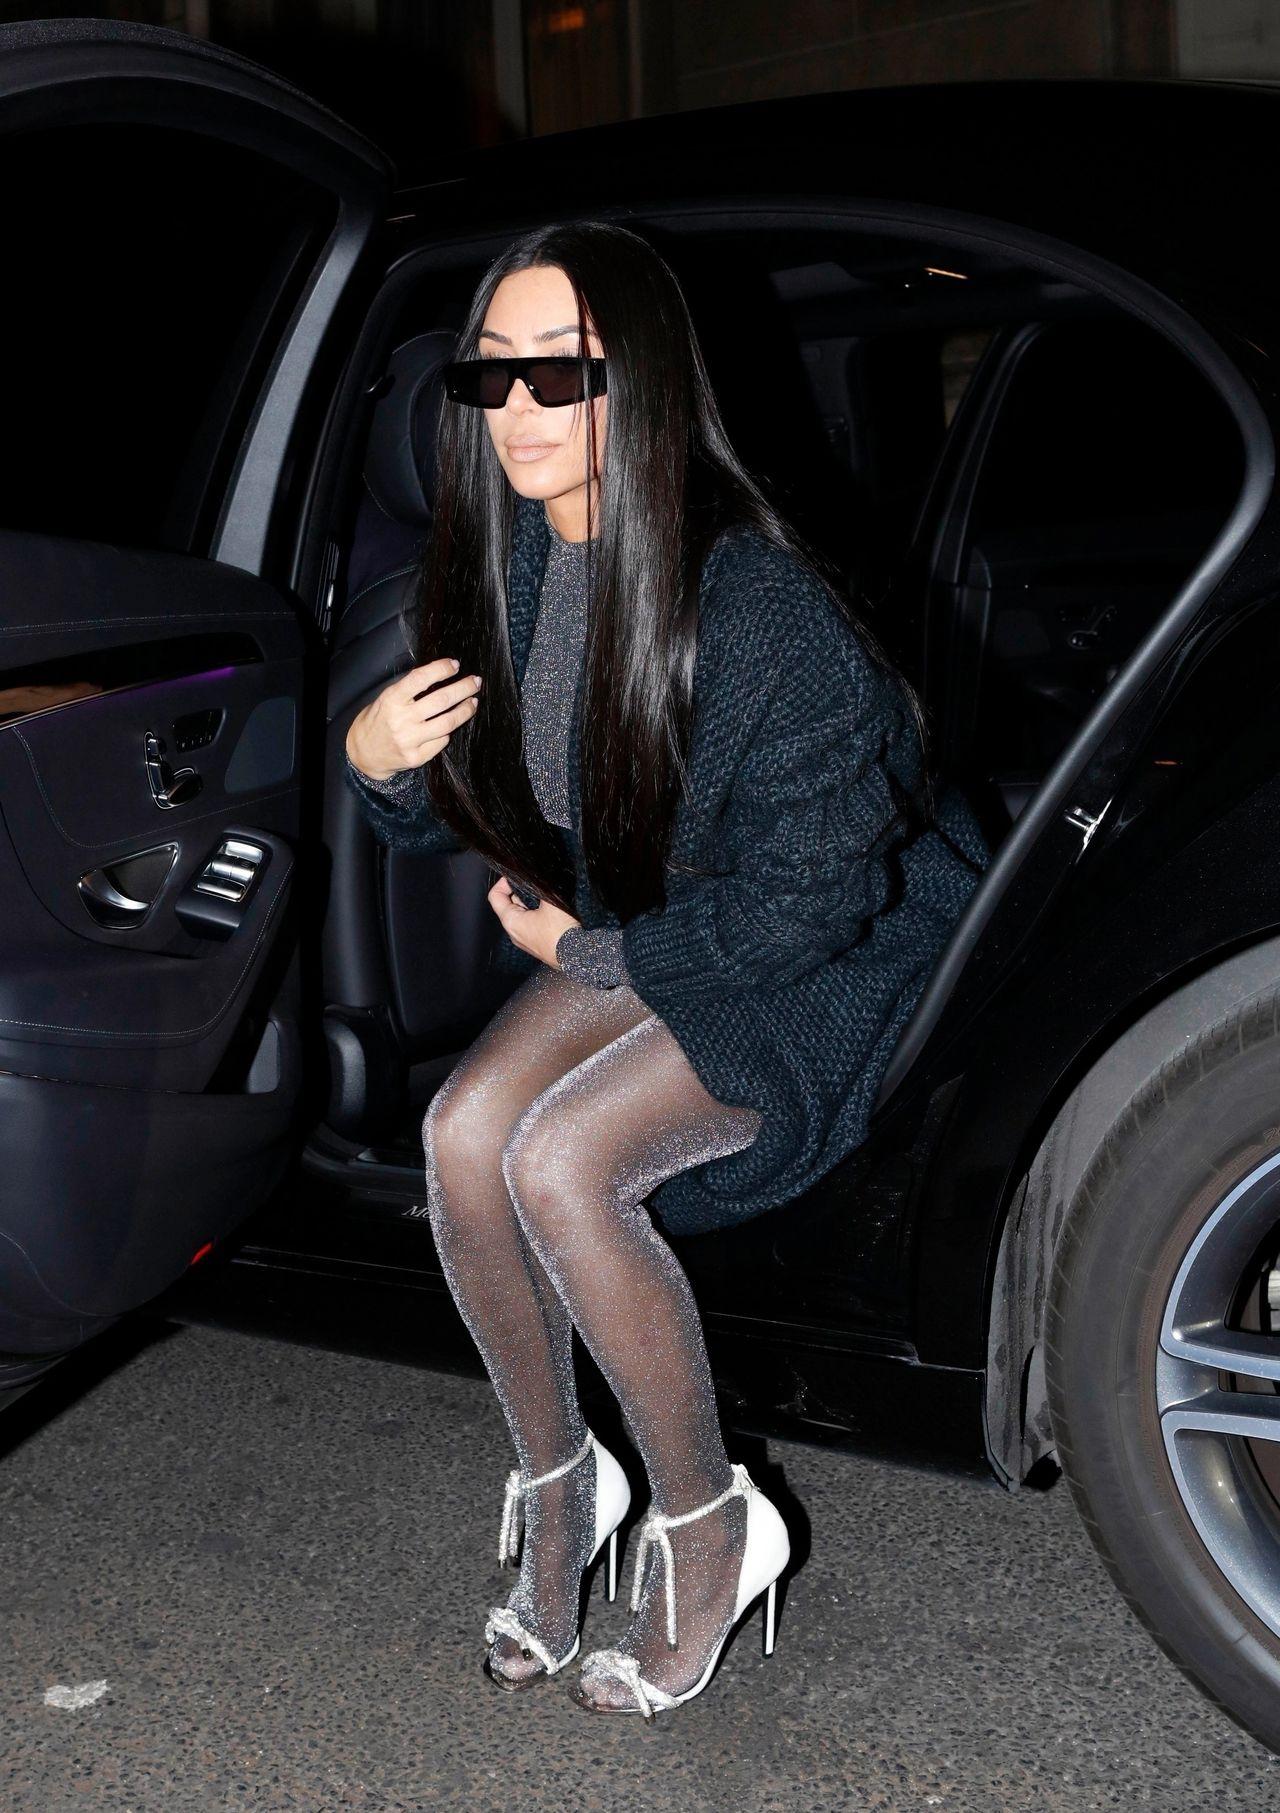 Kim Kardashian shows off her famous curves in sparkling grey unitard as she leaves her hotel in Paris / No credit / BACKGRID , kod: Kim Kardashian